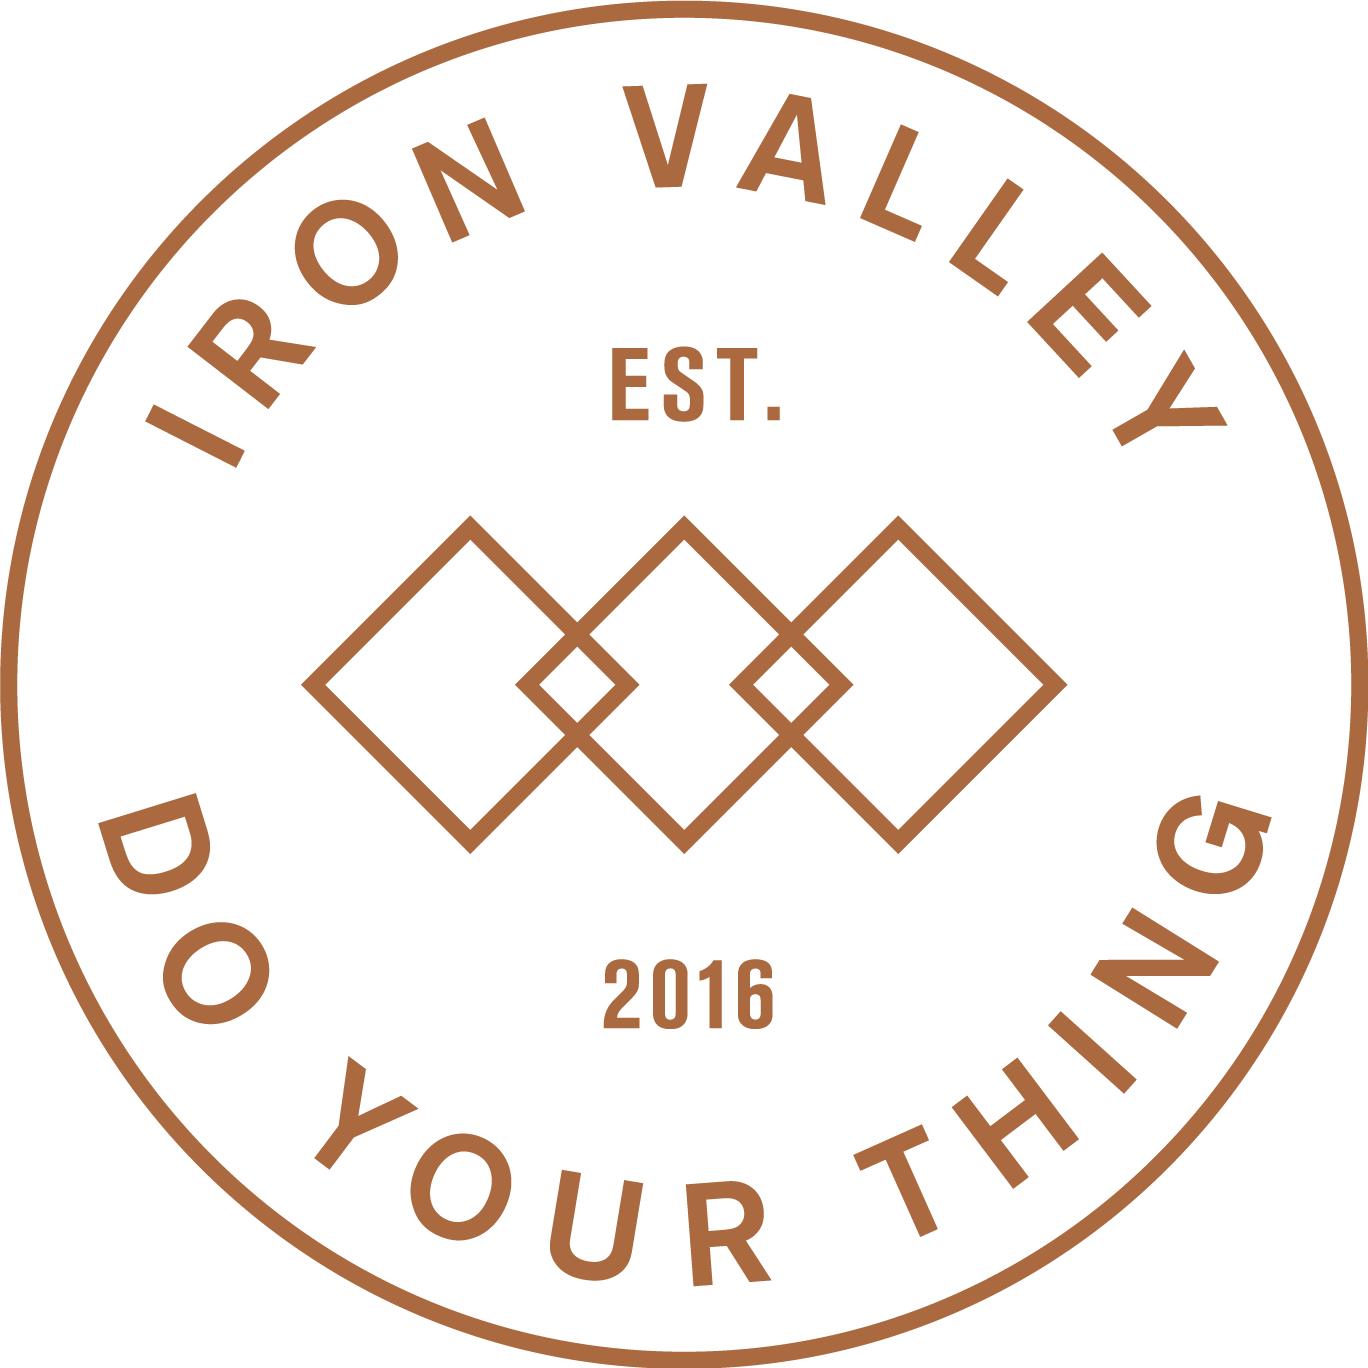 Iron Valley Real Estate Pocono